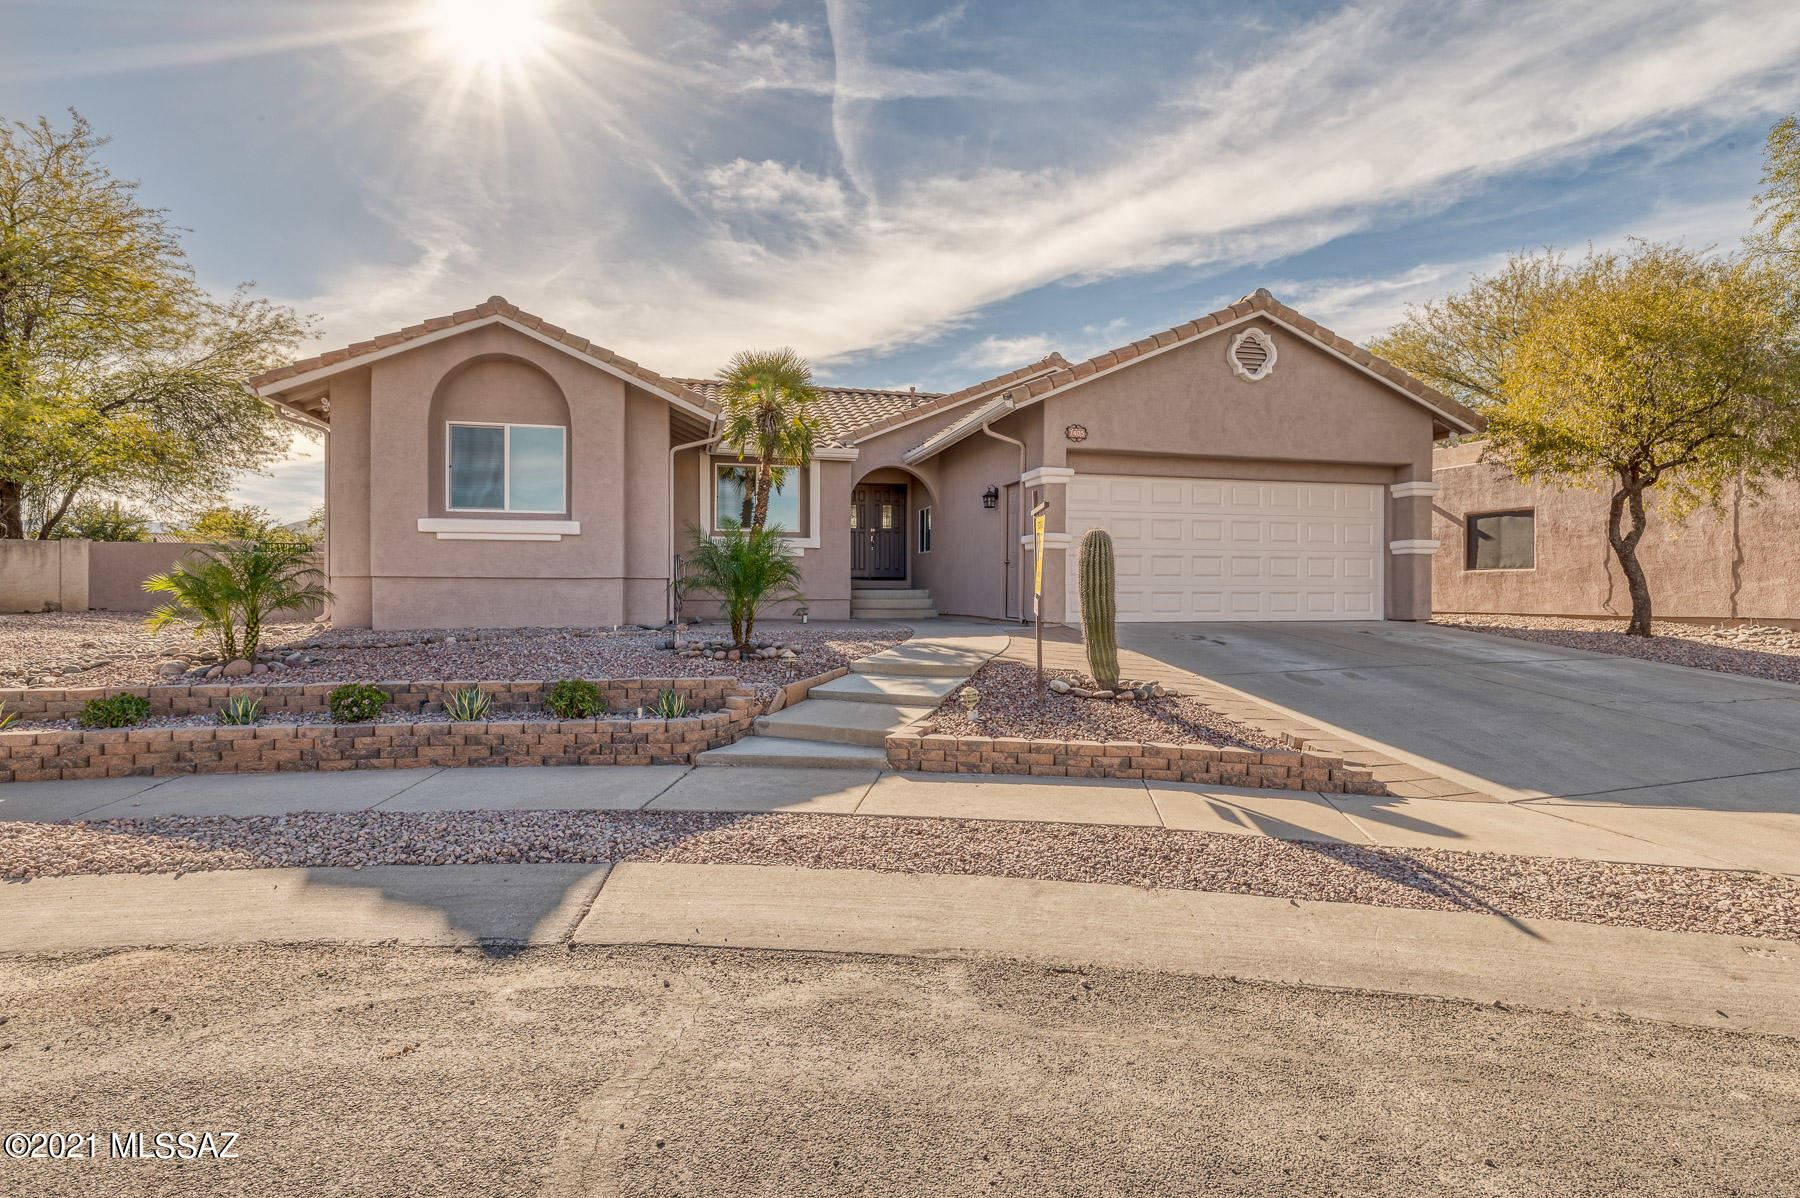 7405 W Mountain Sky Drive, Tucson, AZ 85743 - MLS#: 22100635